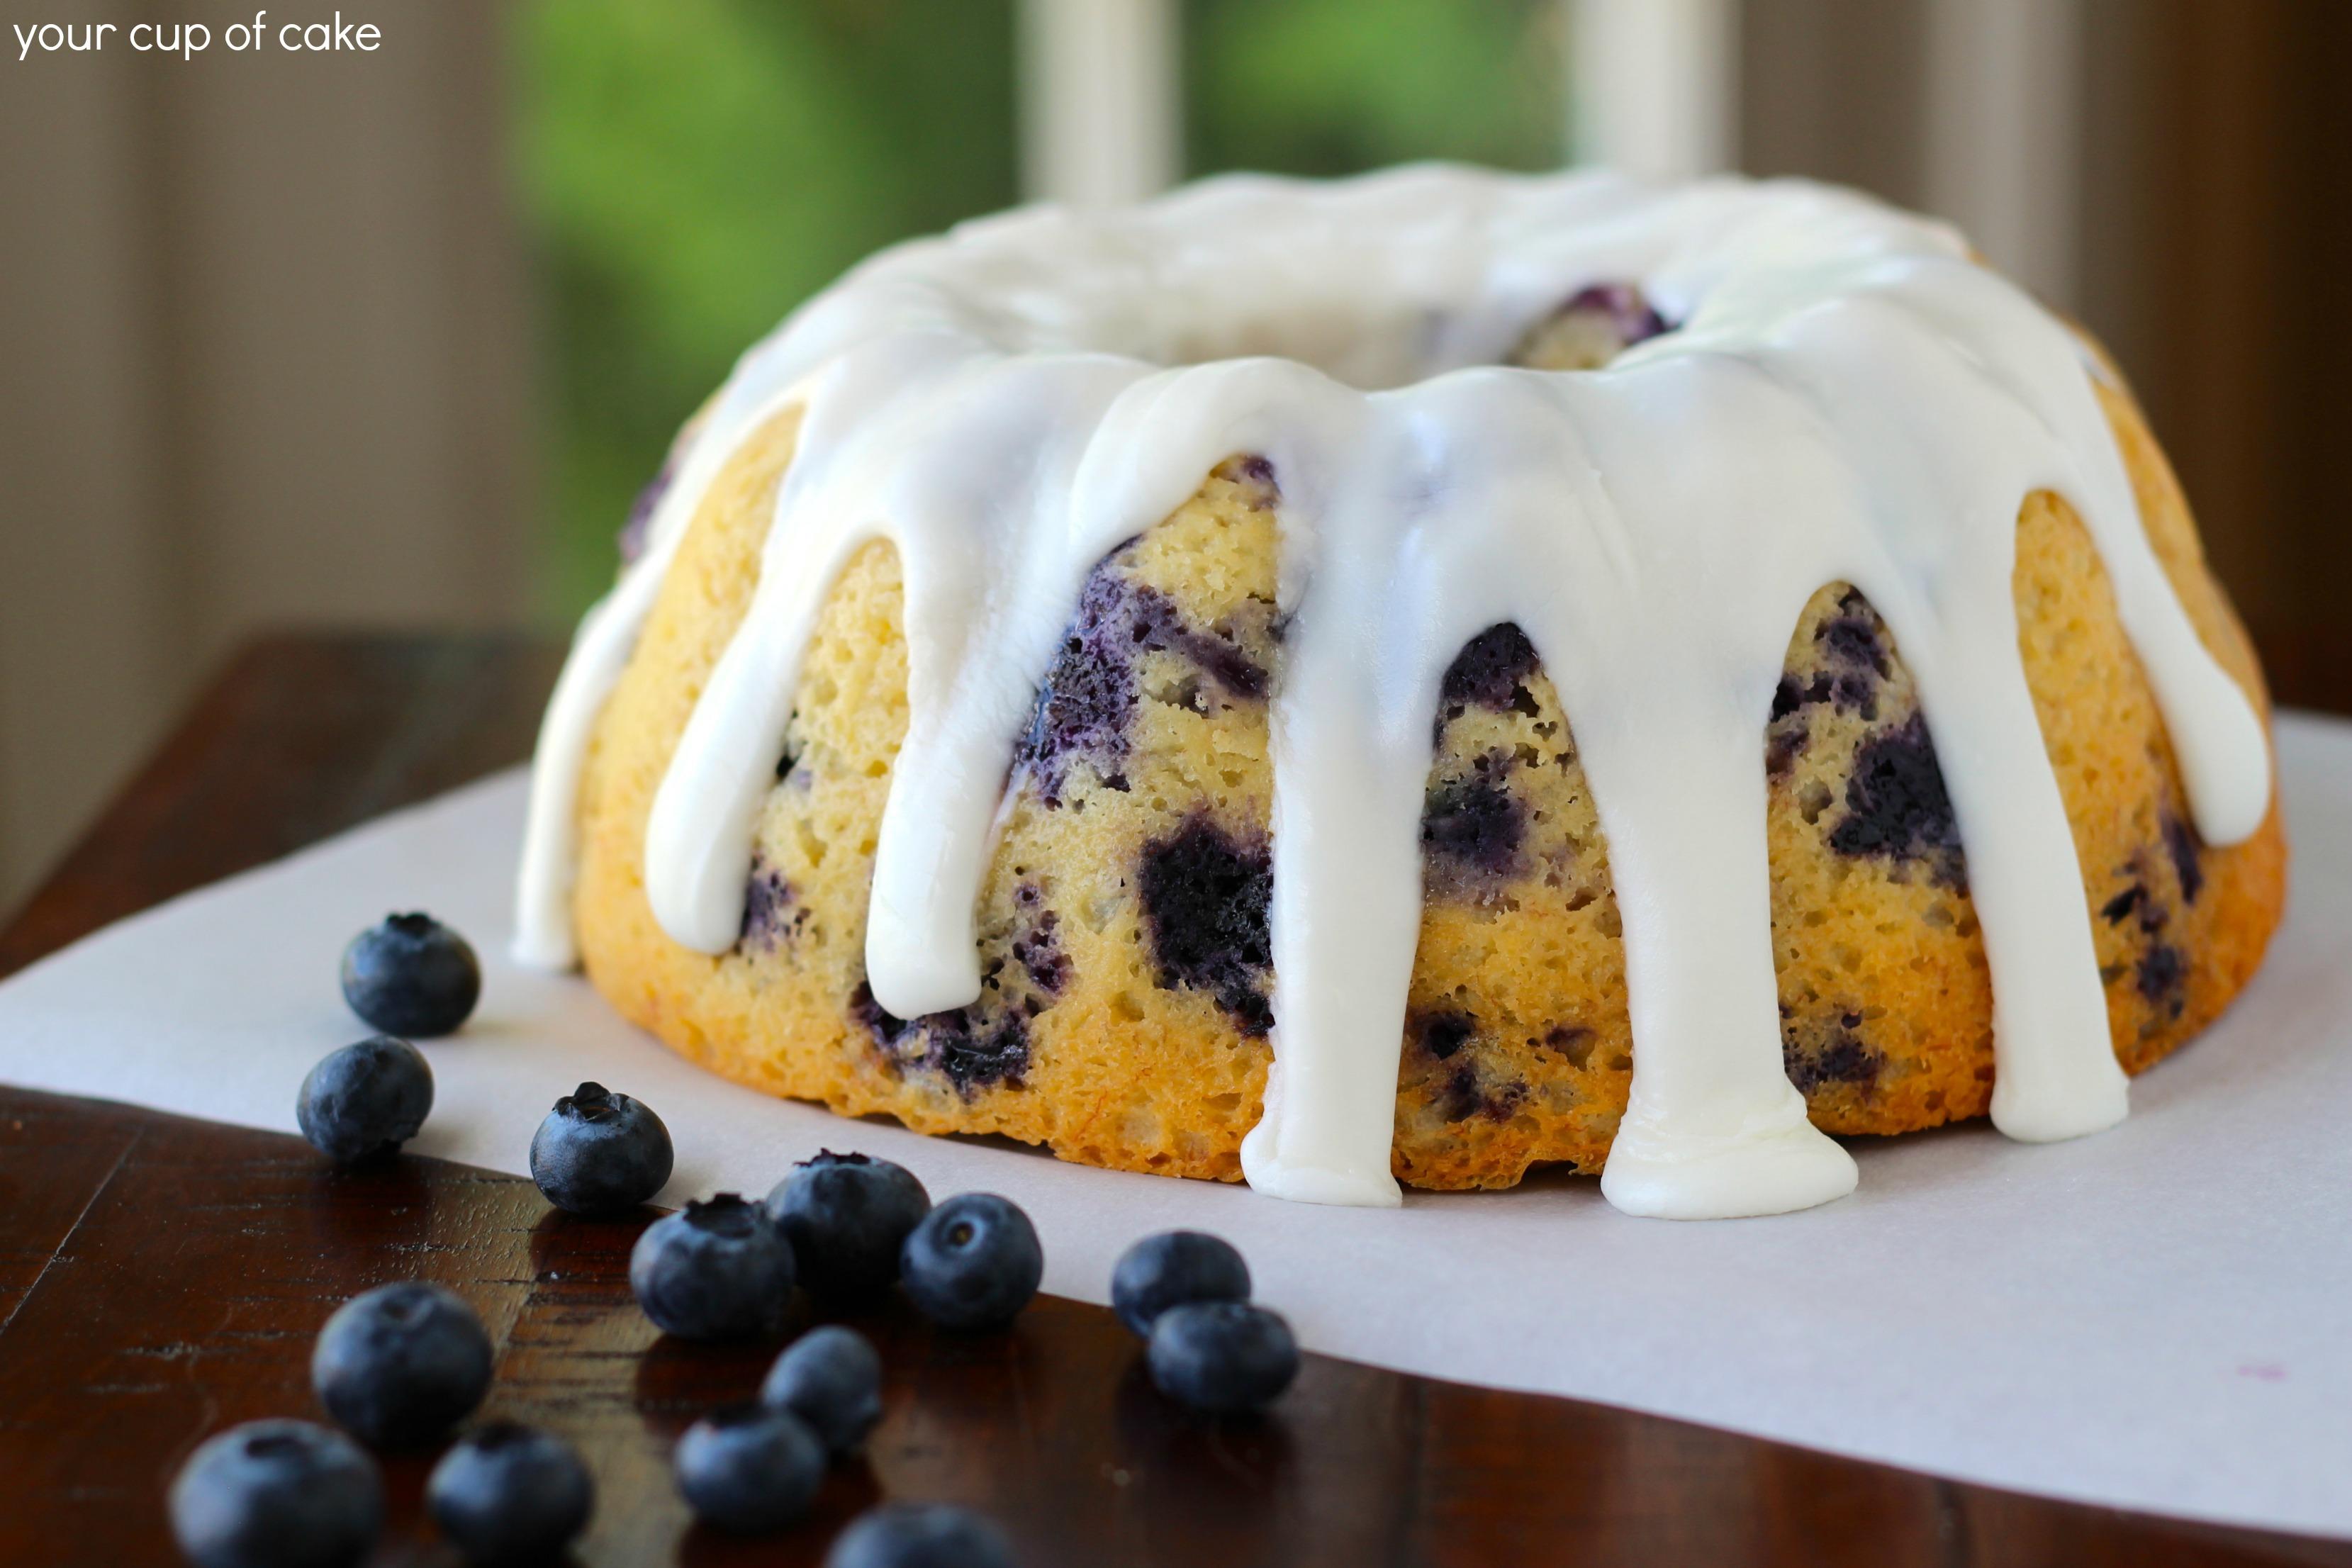 Lemon Blueberry Swirl Cake Recipe